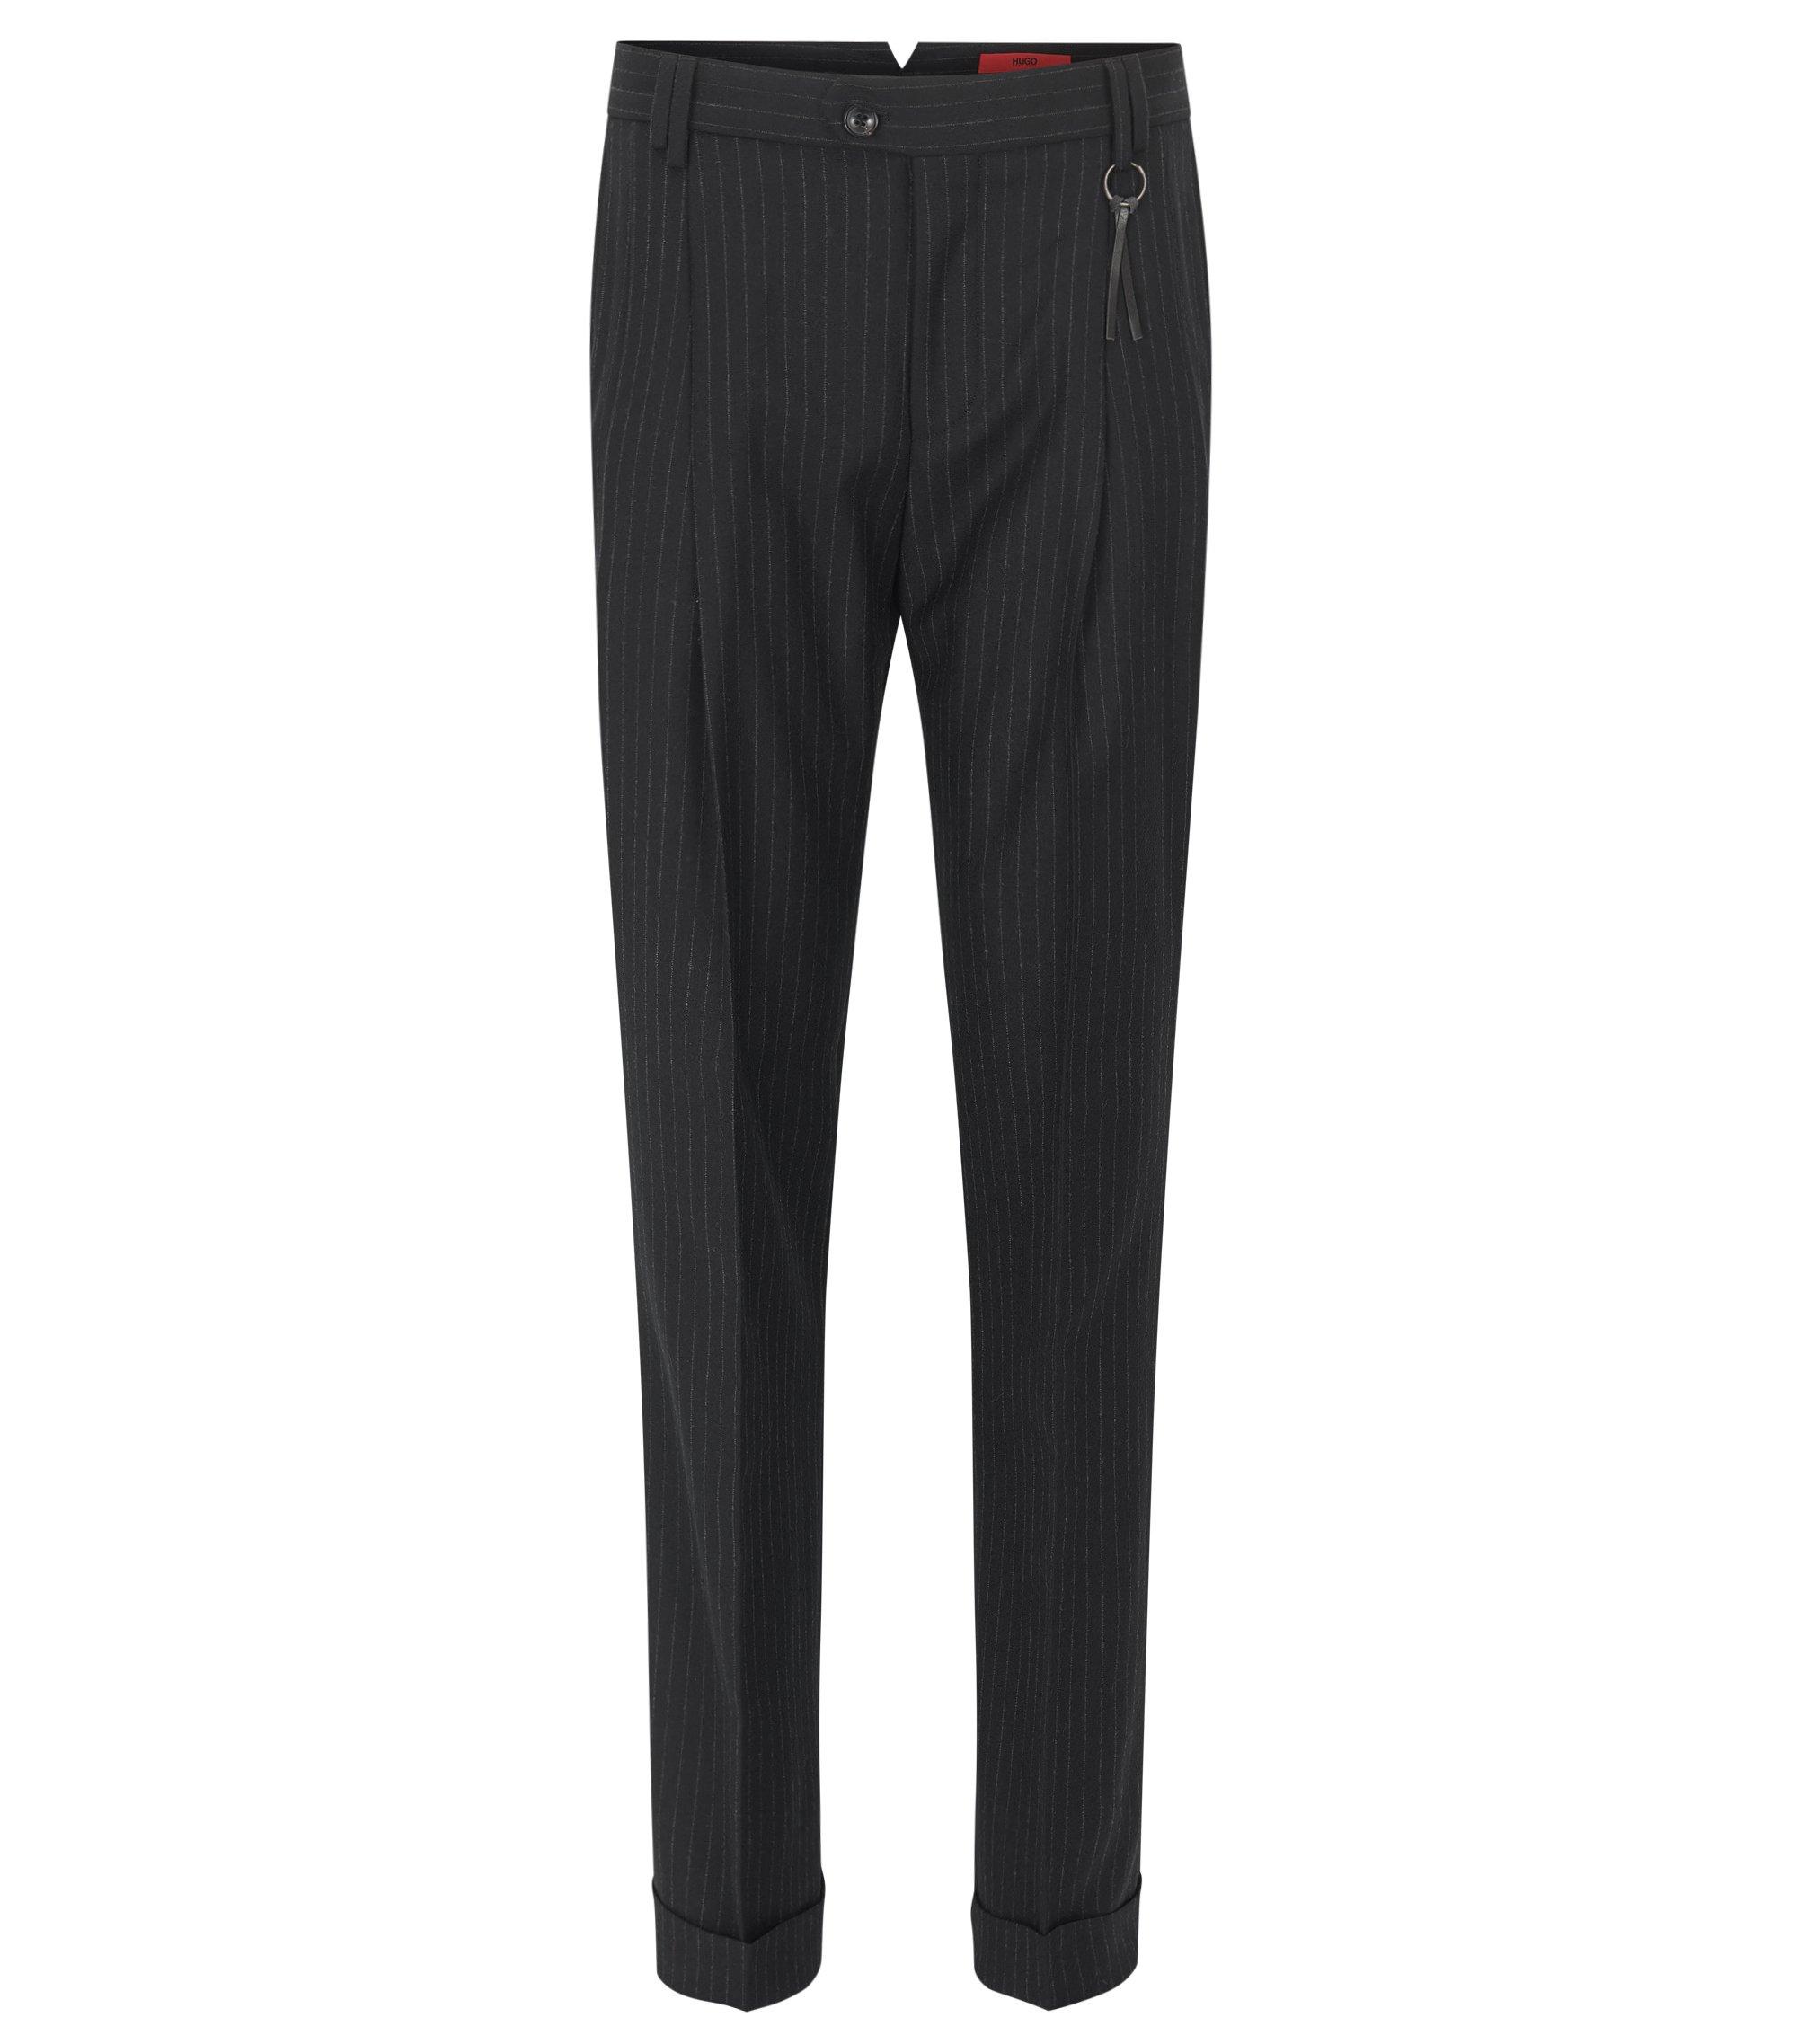 Pantalones relaxed fit en lana virgen con raya diplomática, Negro